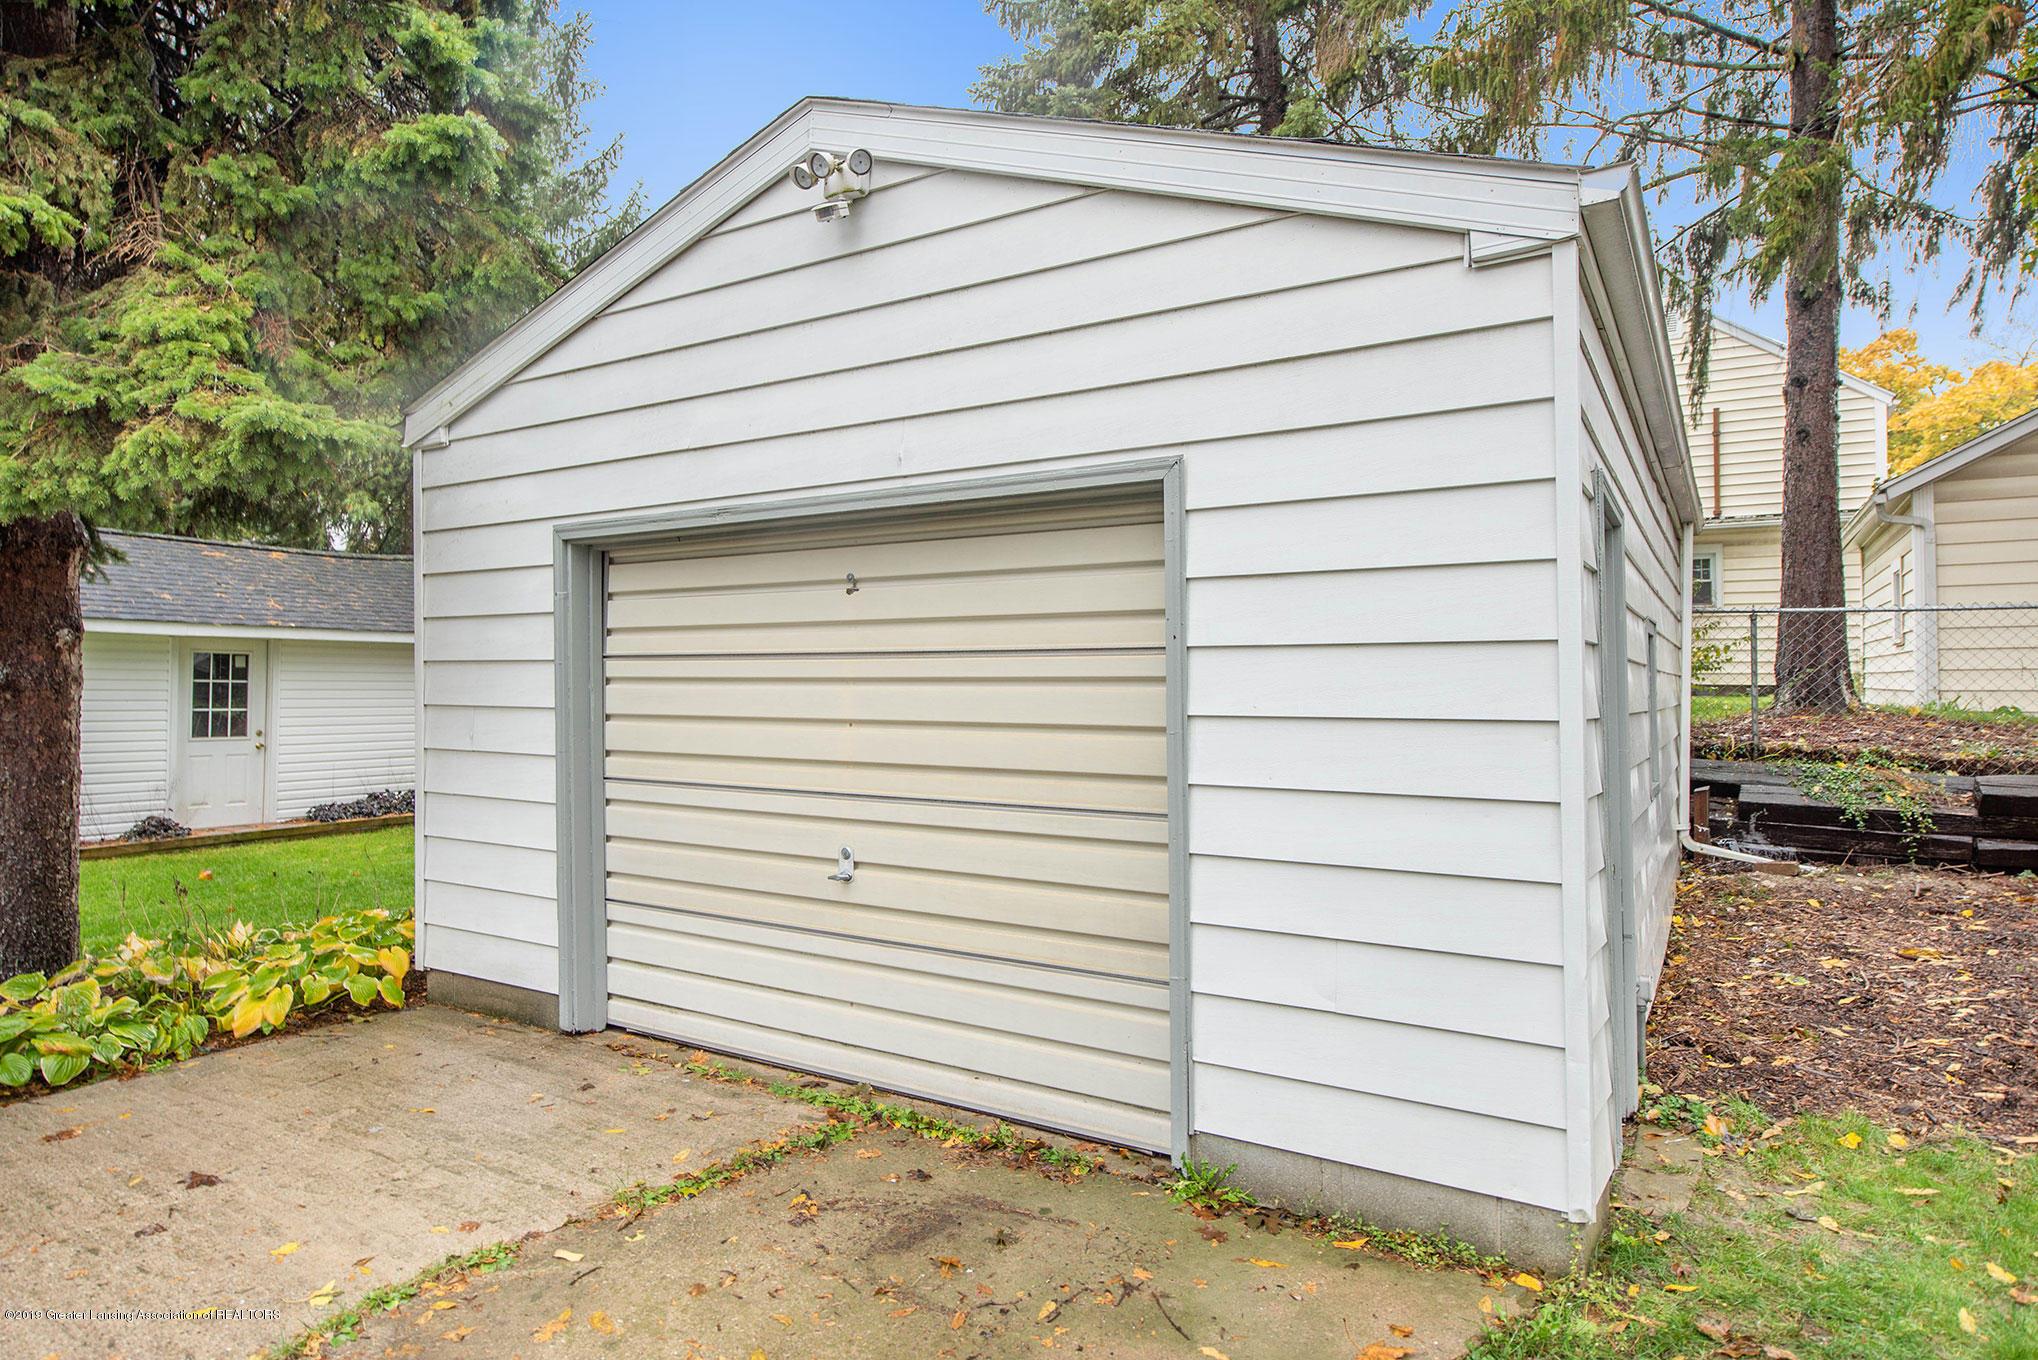 801 Merrill Ave - Exterior - 22